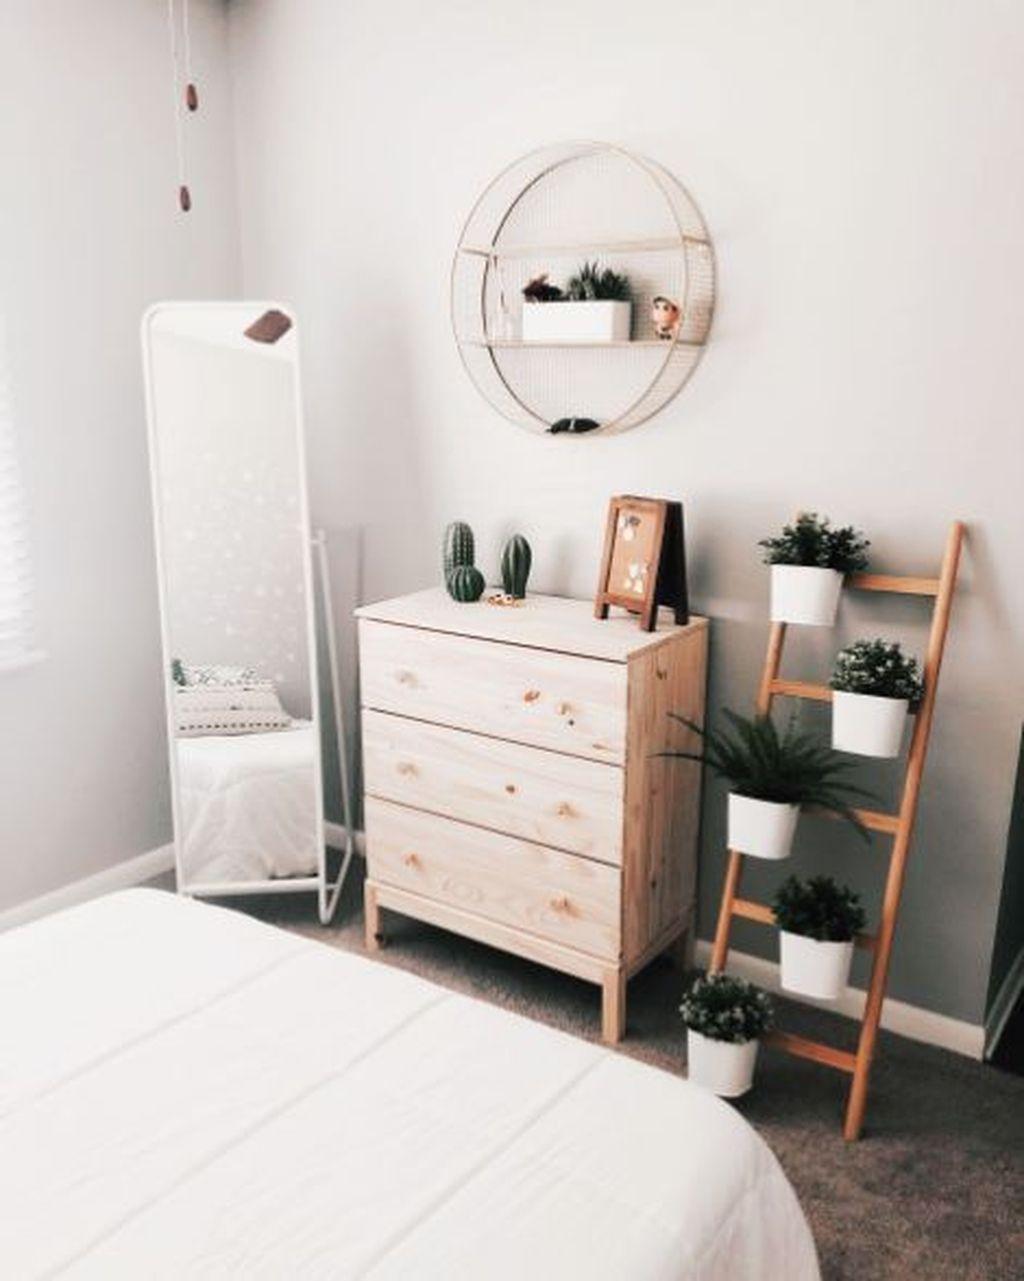 Best Minimalist Bedroom Design Ideas To Try Asap 09